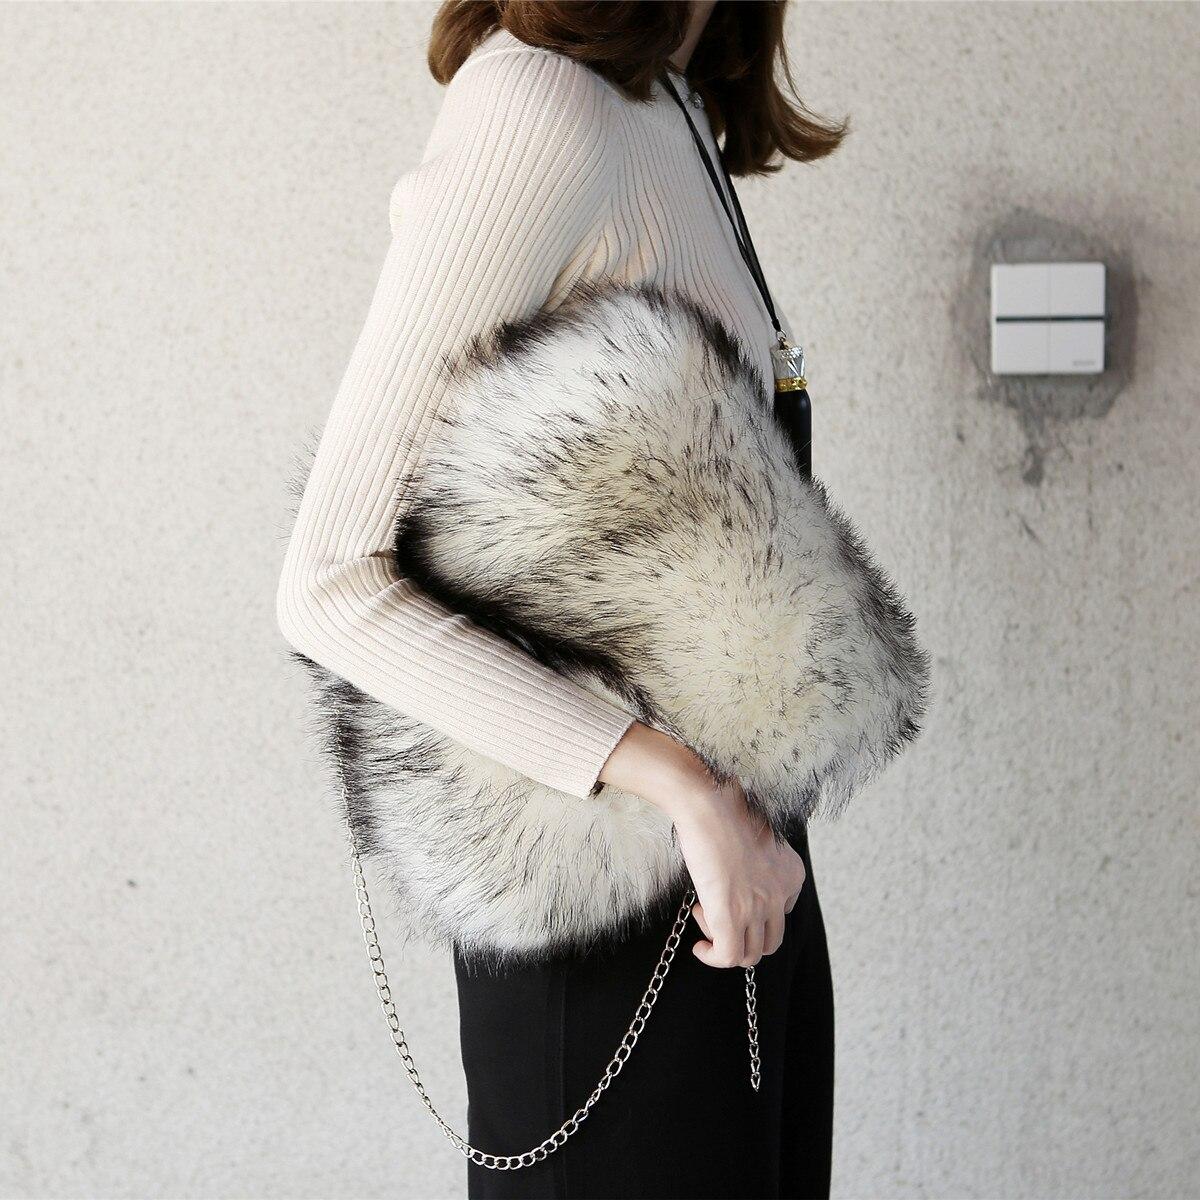 European Style Women Faux Raccon Fur Brief Cases Cute Fluffy Plush Vest Tote Bags Super Cute Multicolors Fur Soft Handbags